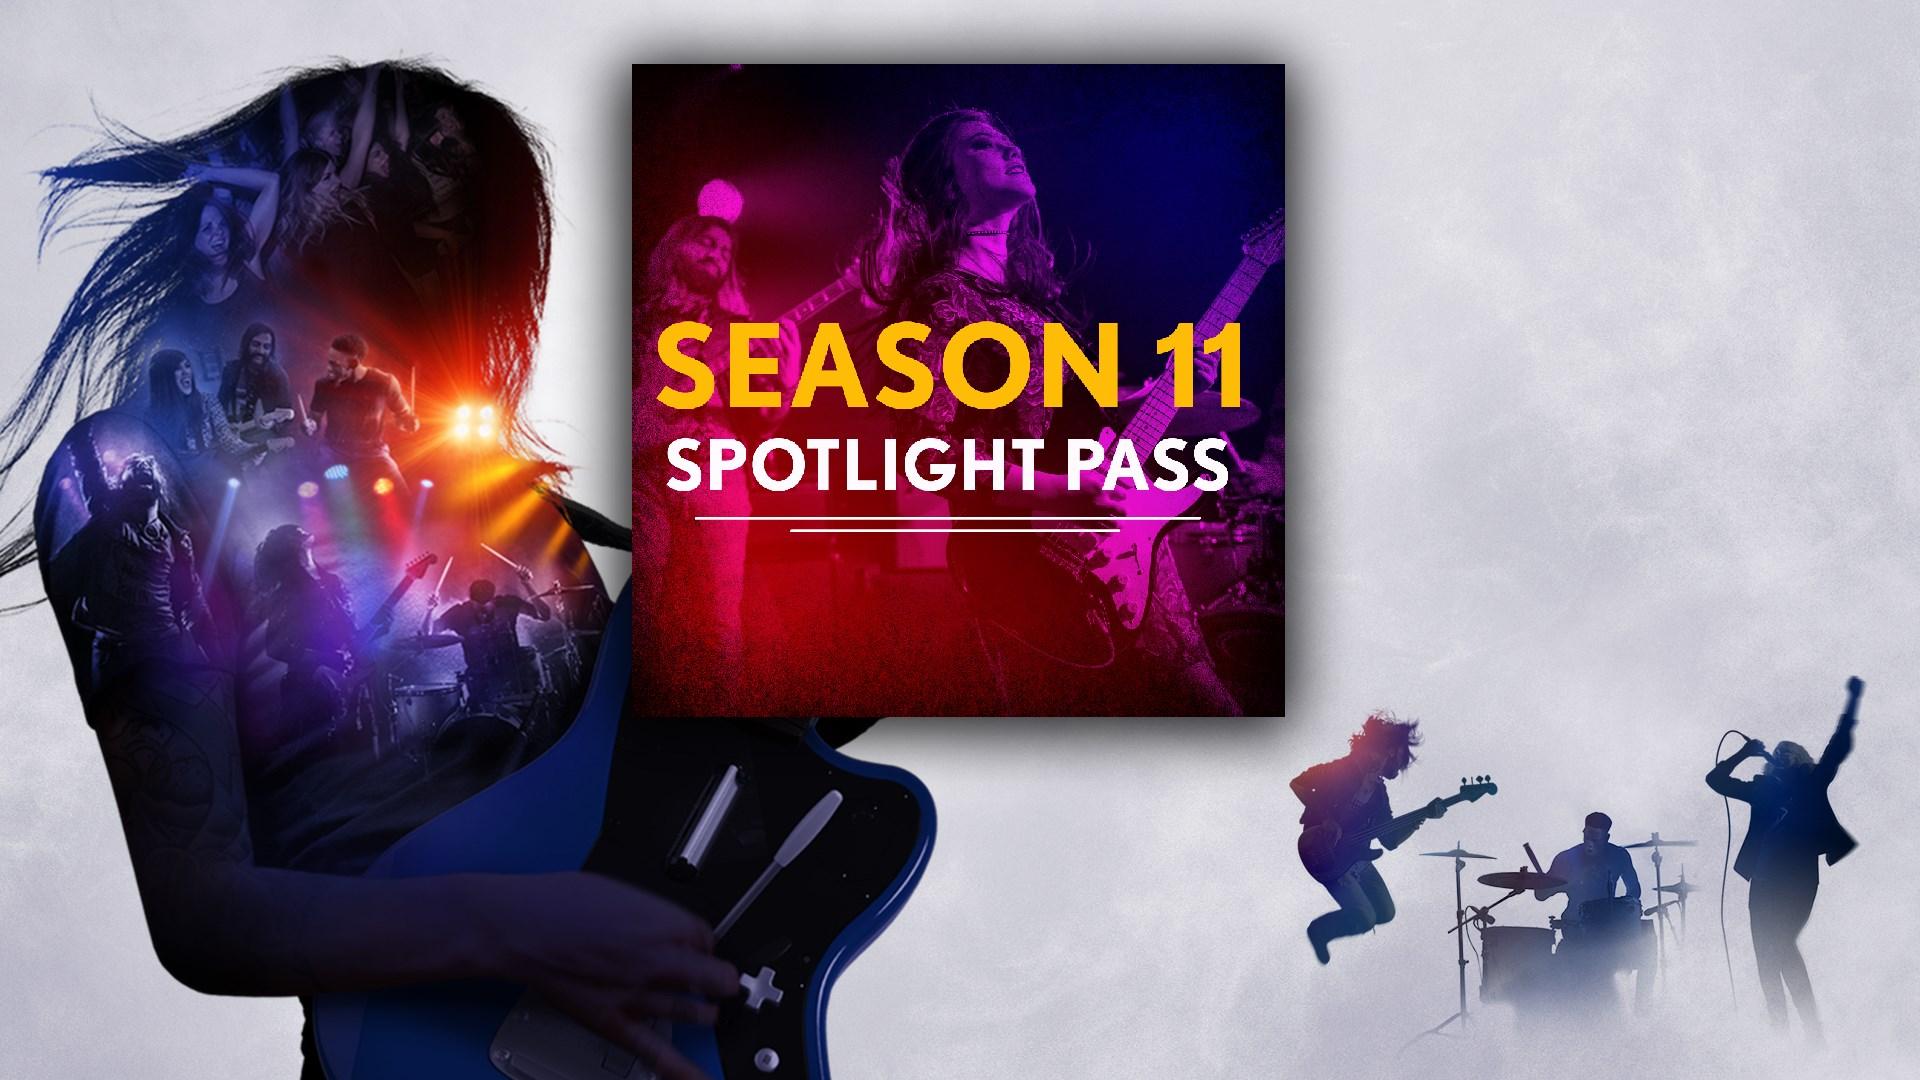 Season 11 Spotlight Pass